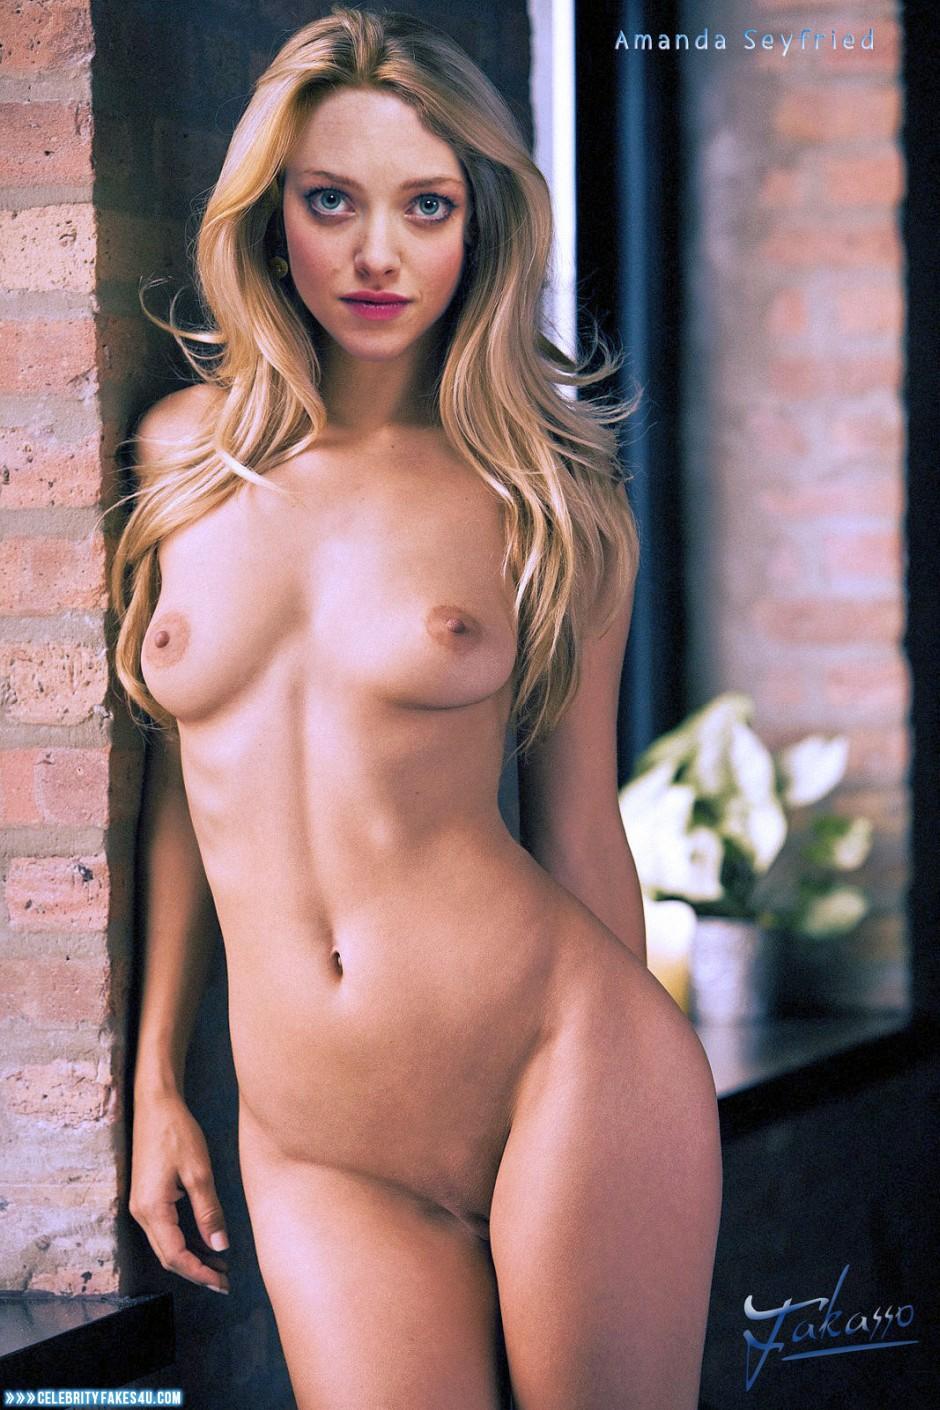 Not amanda seyfried nude fakes sorry